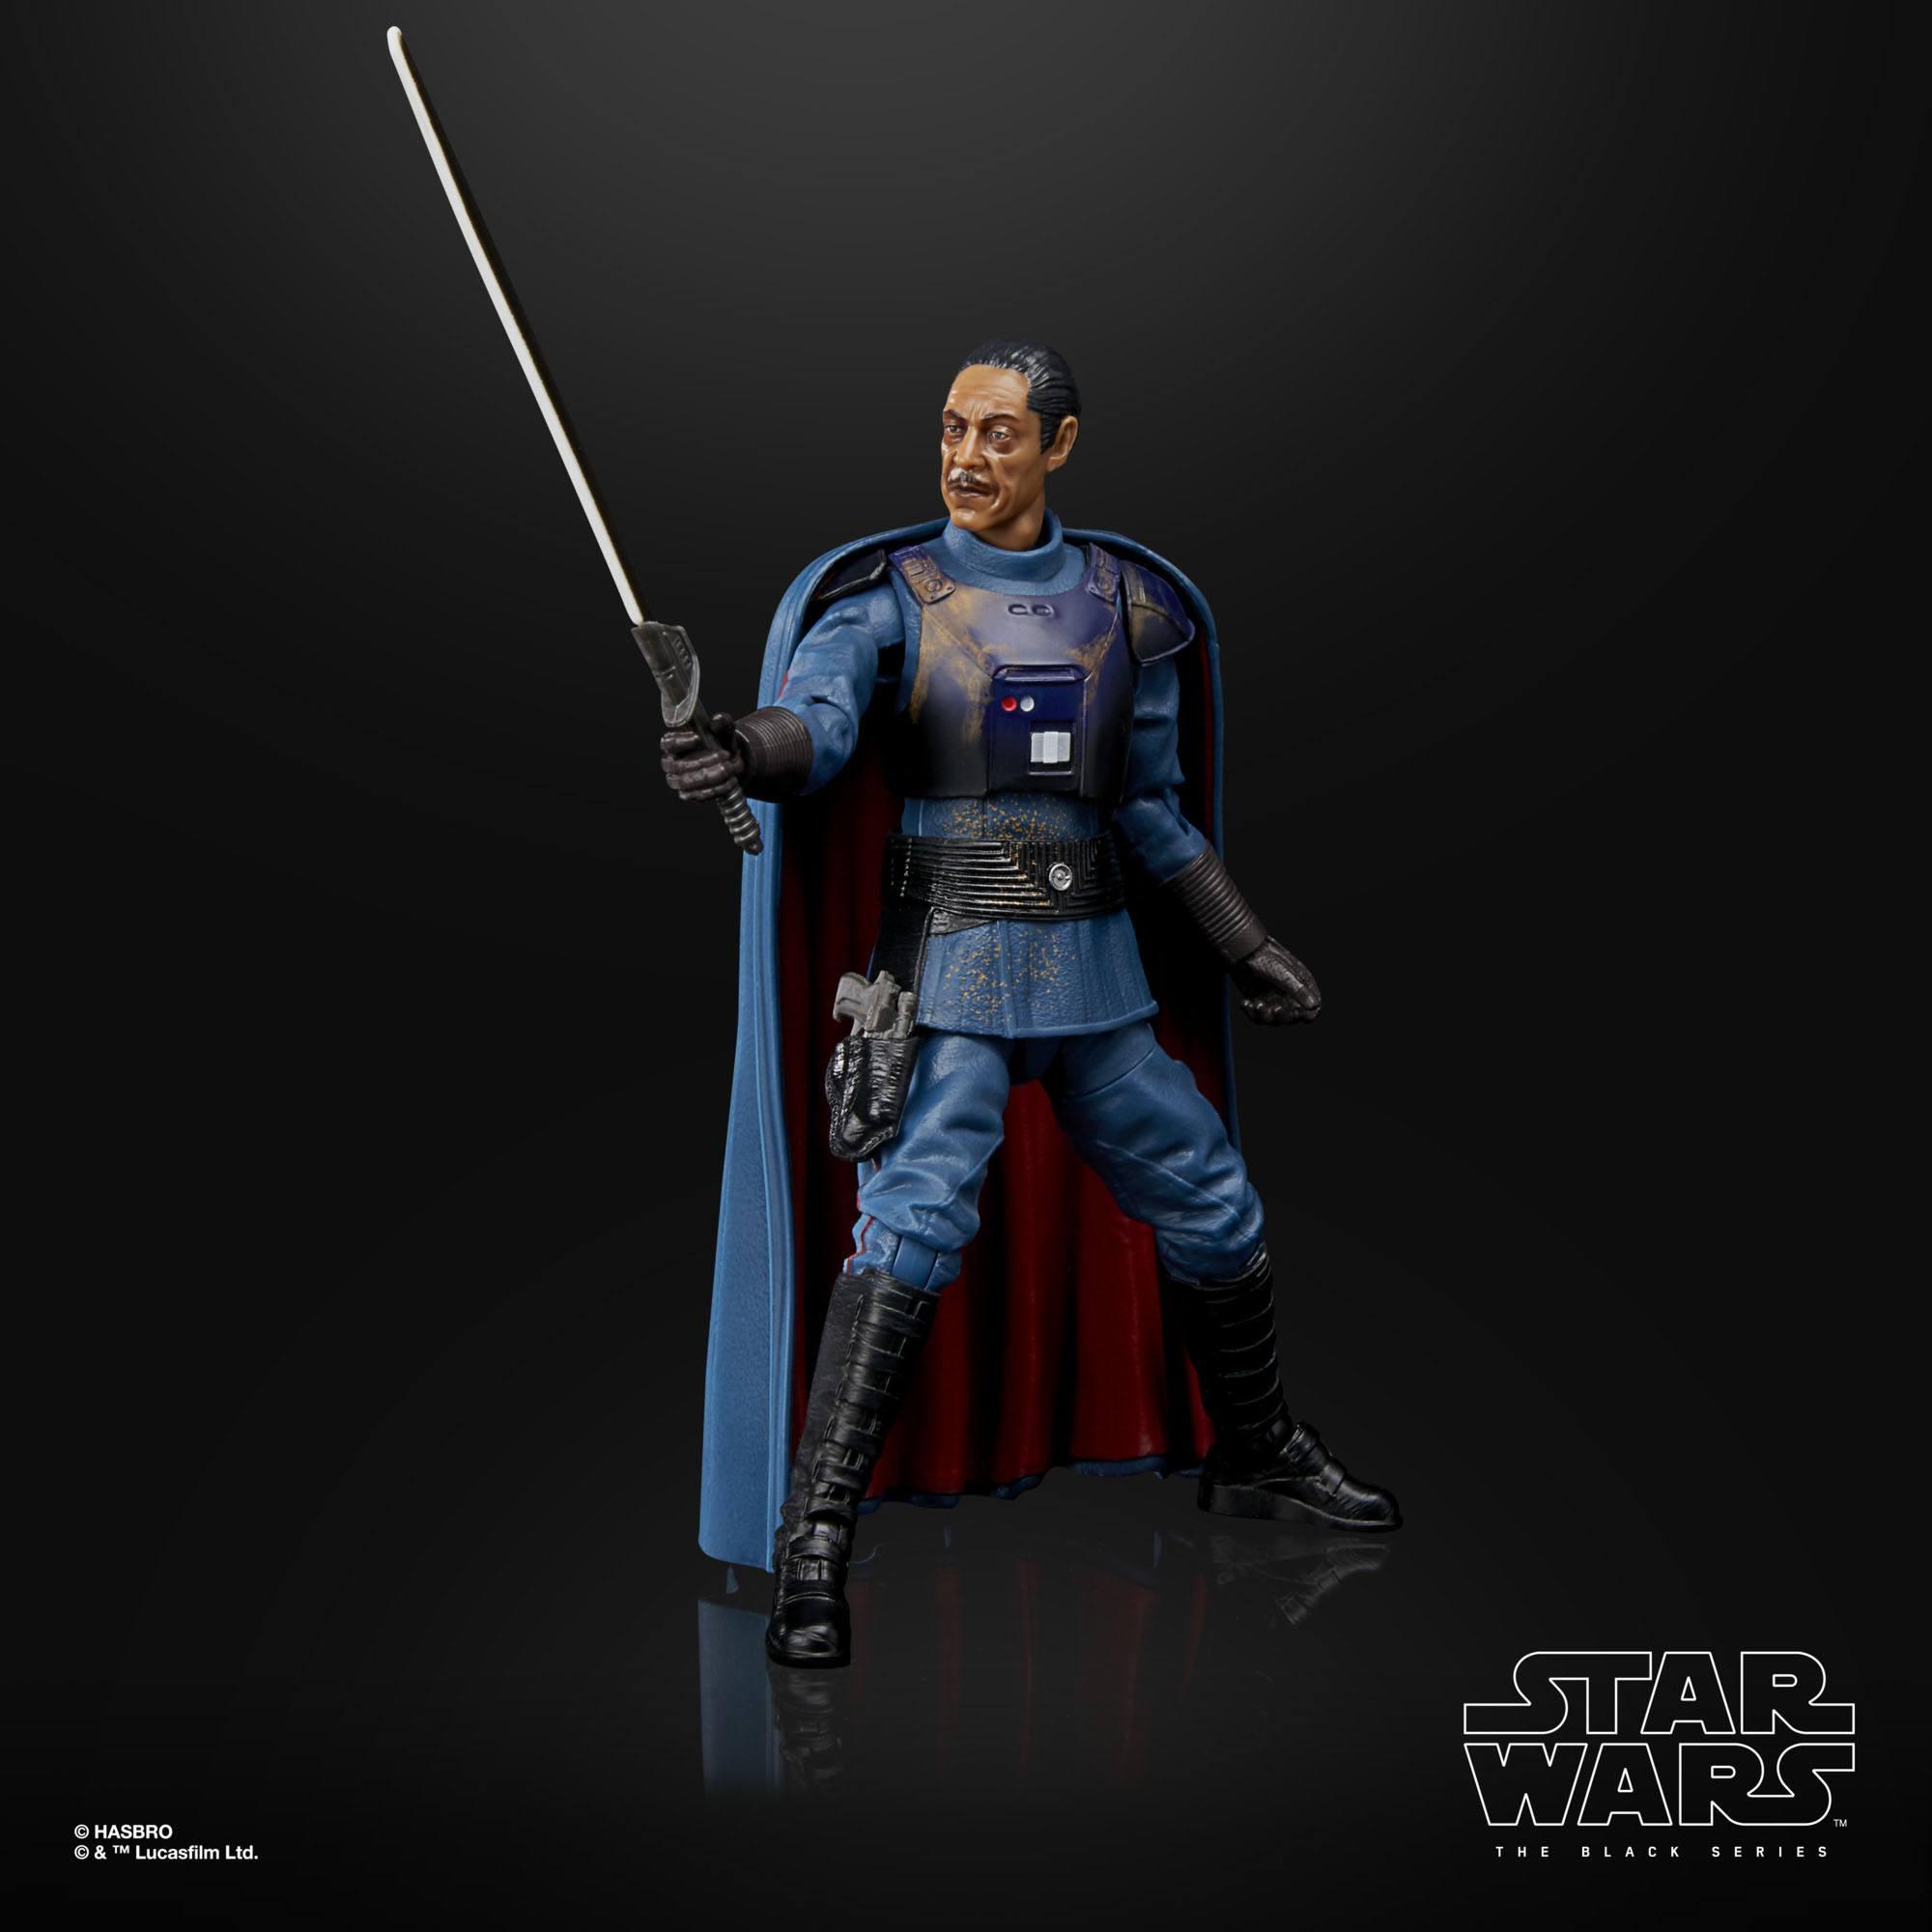 Star Wars The Mandalorian Black Series Credit Collection Actionfigur 2022 Moff Gideon 15 cm HASF2894 5010993898909